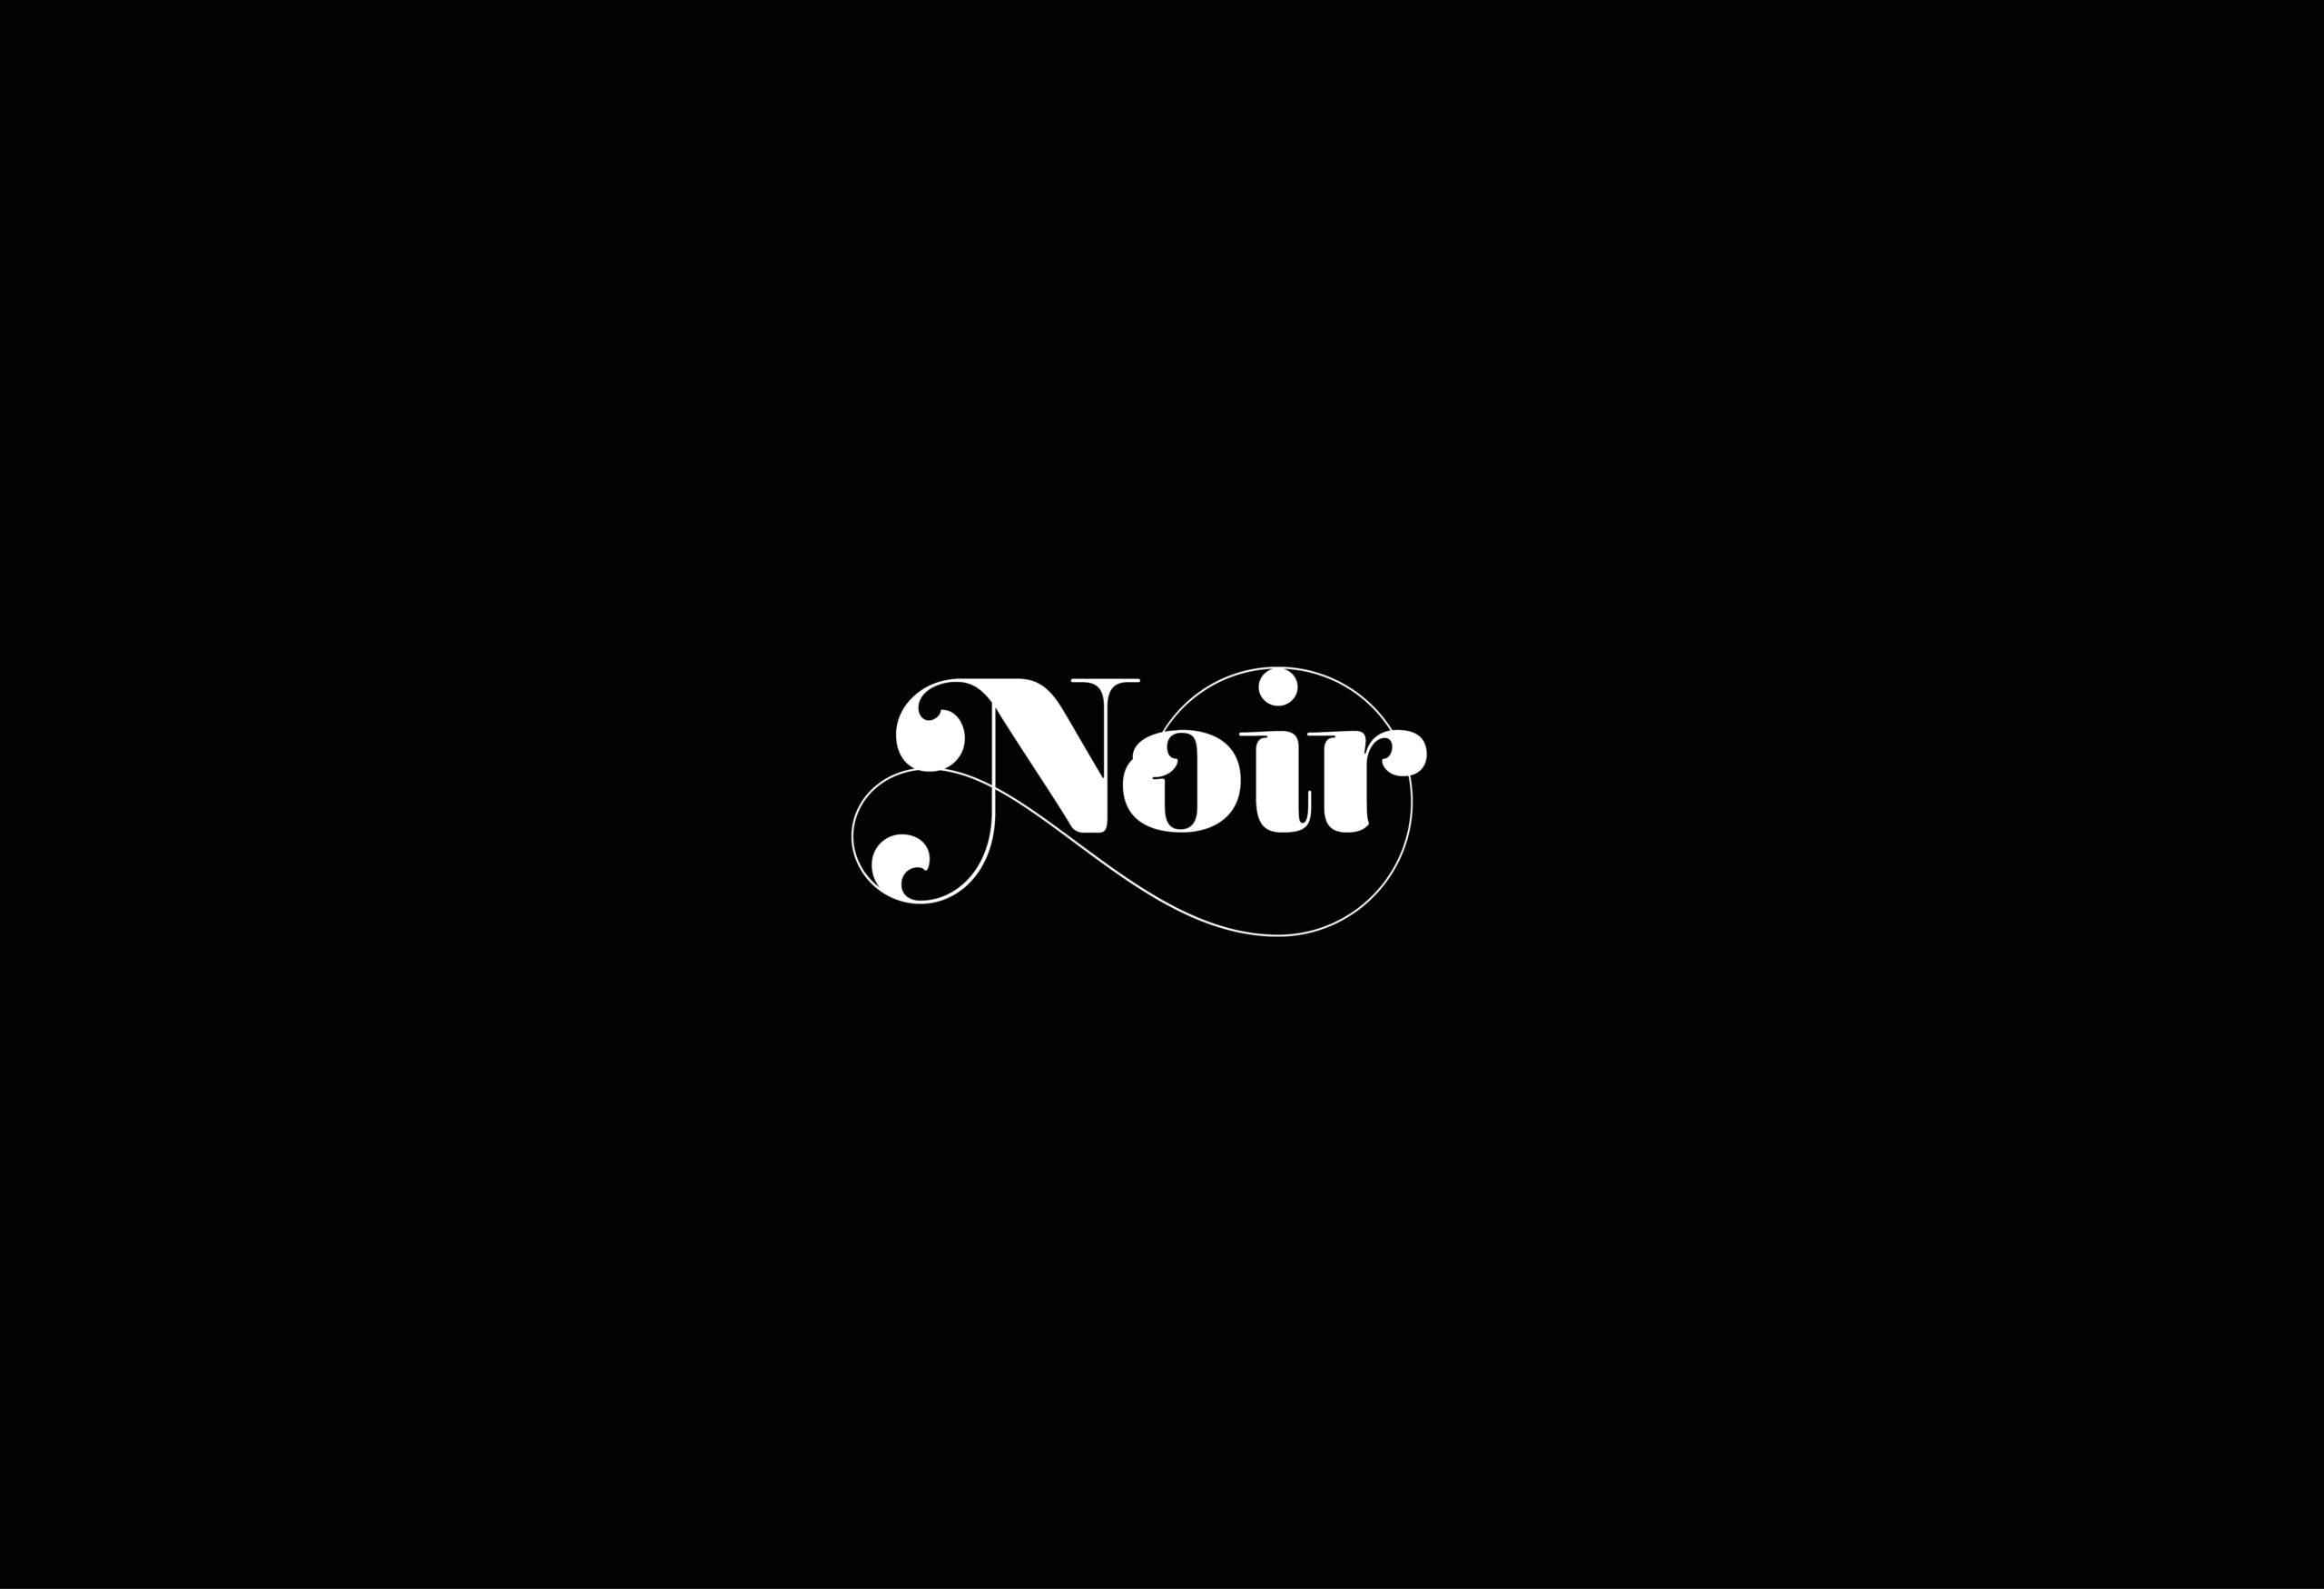 logo-design-nz